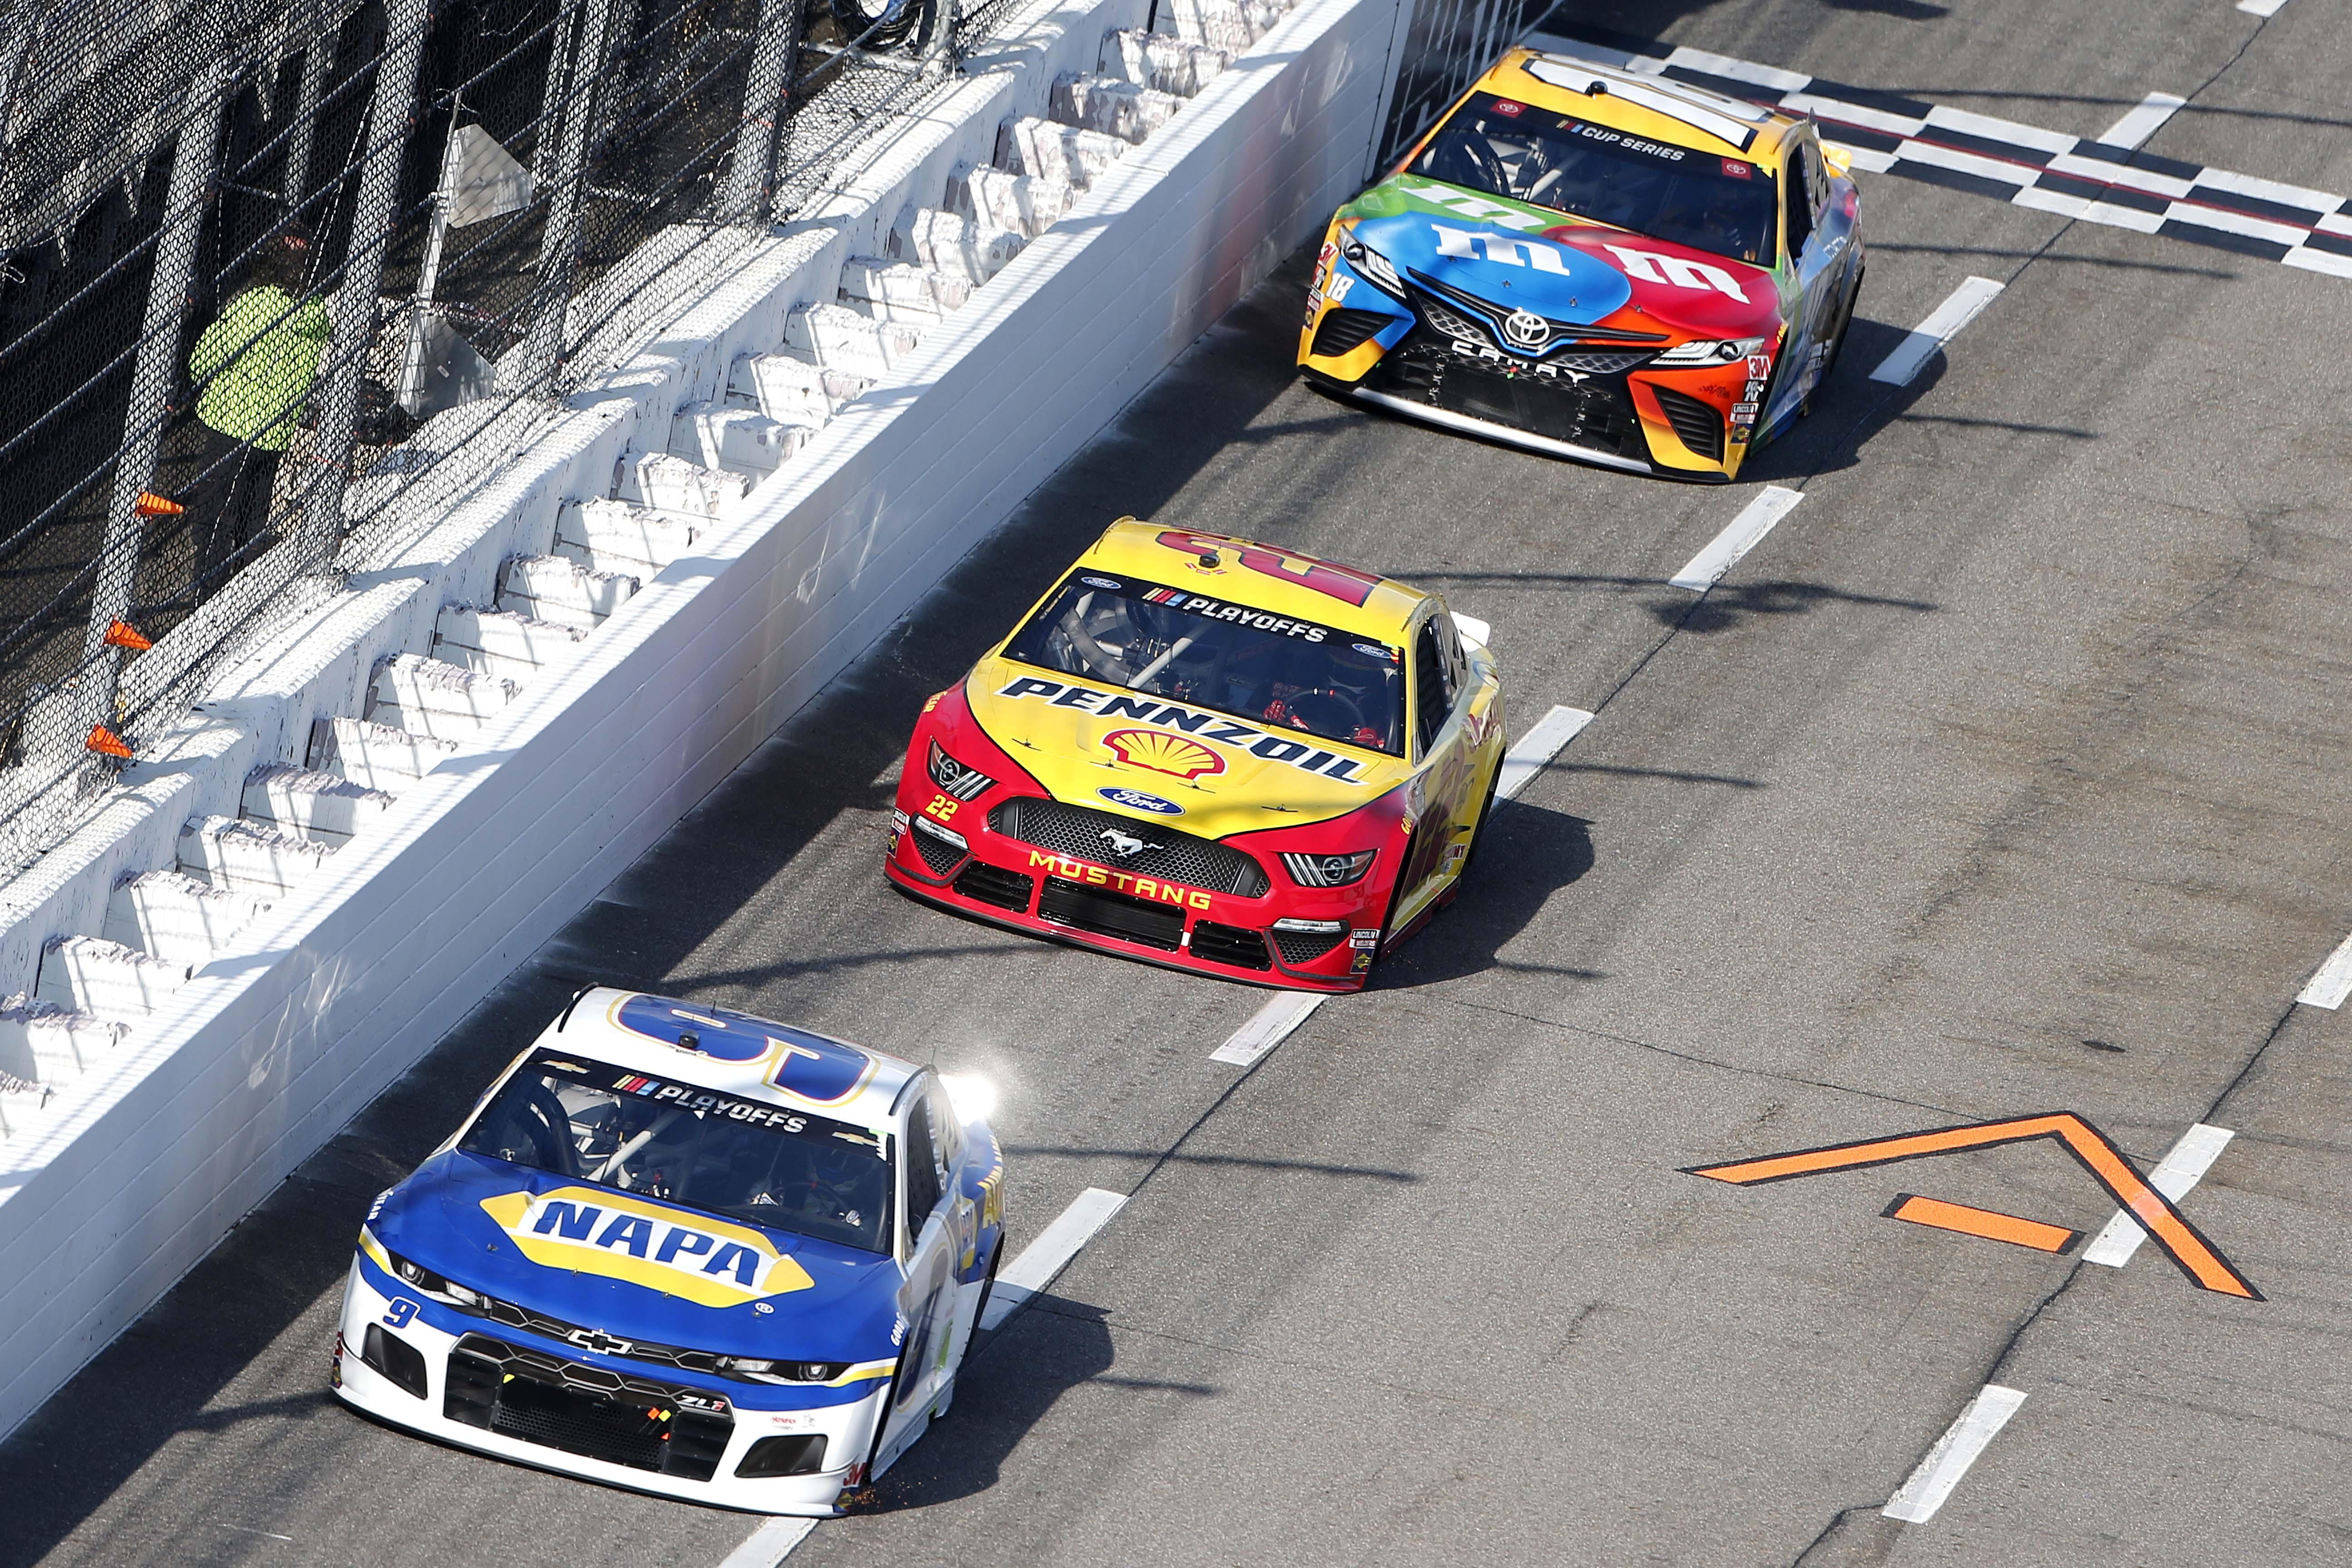 Joey Logano, Kyle Busch and Chase Elliott at Martinsville Speedway - NASCAR Cup Series